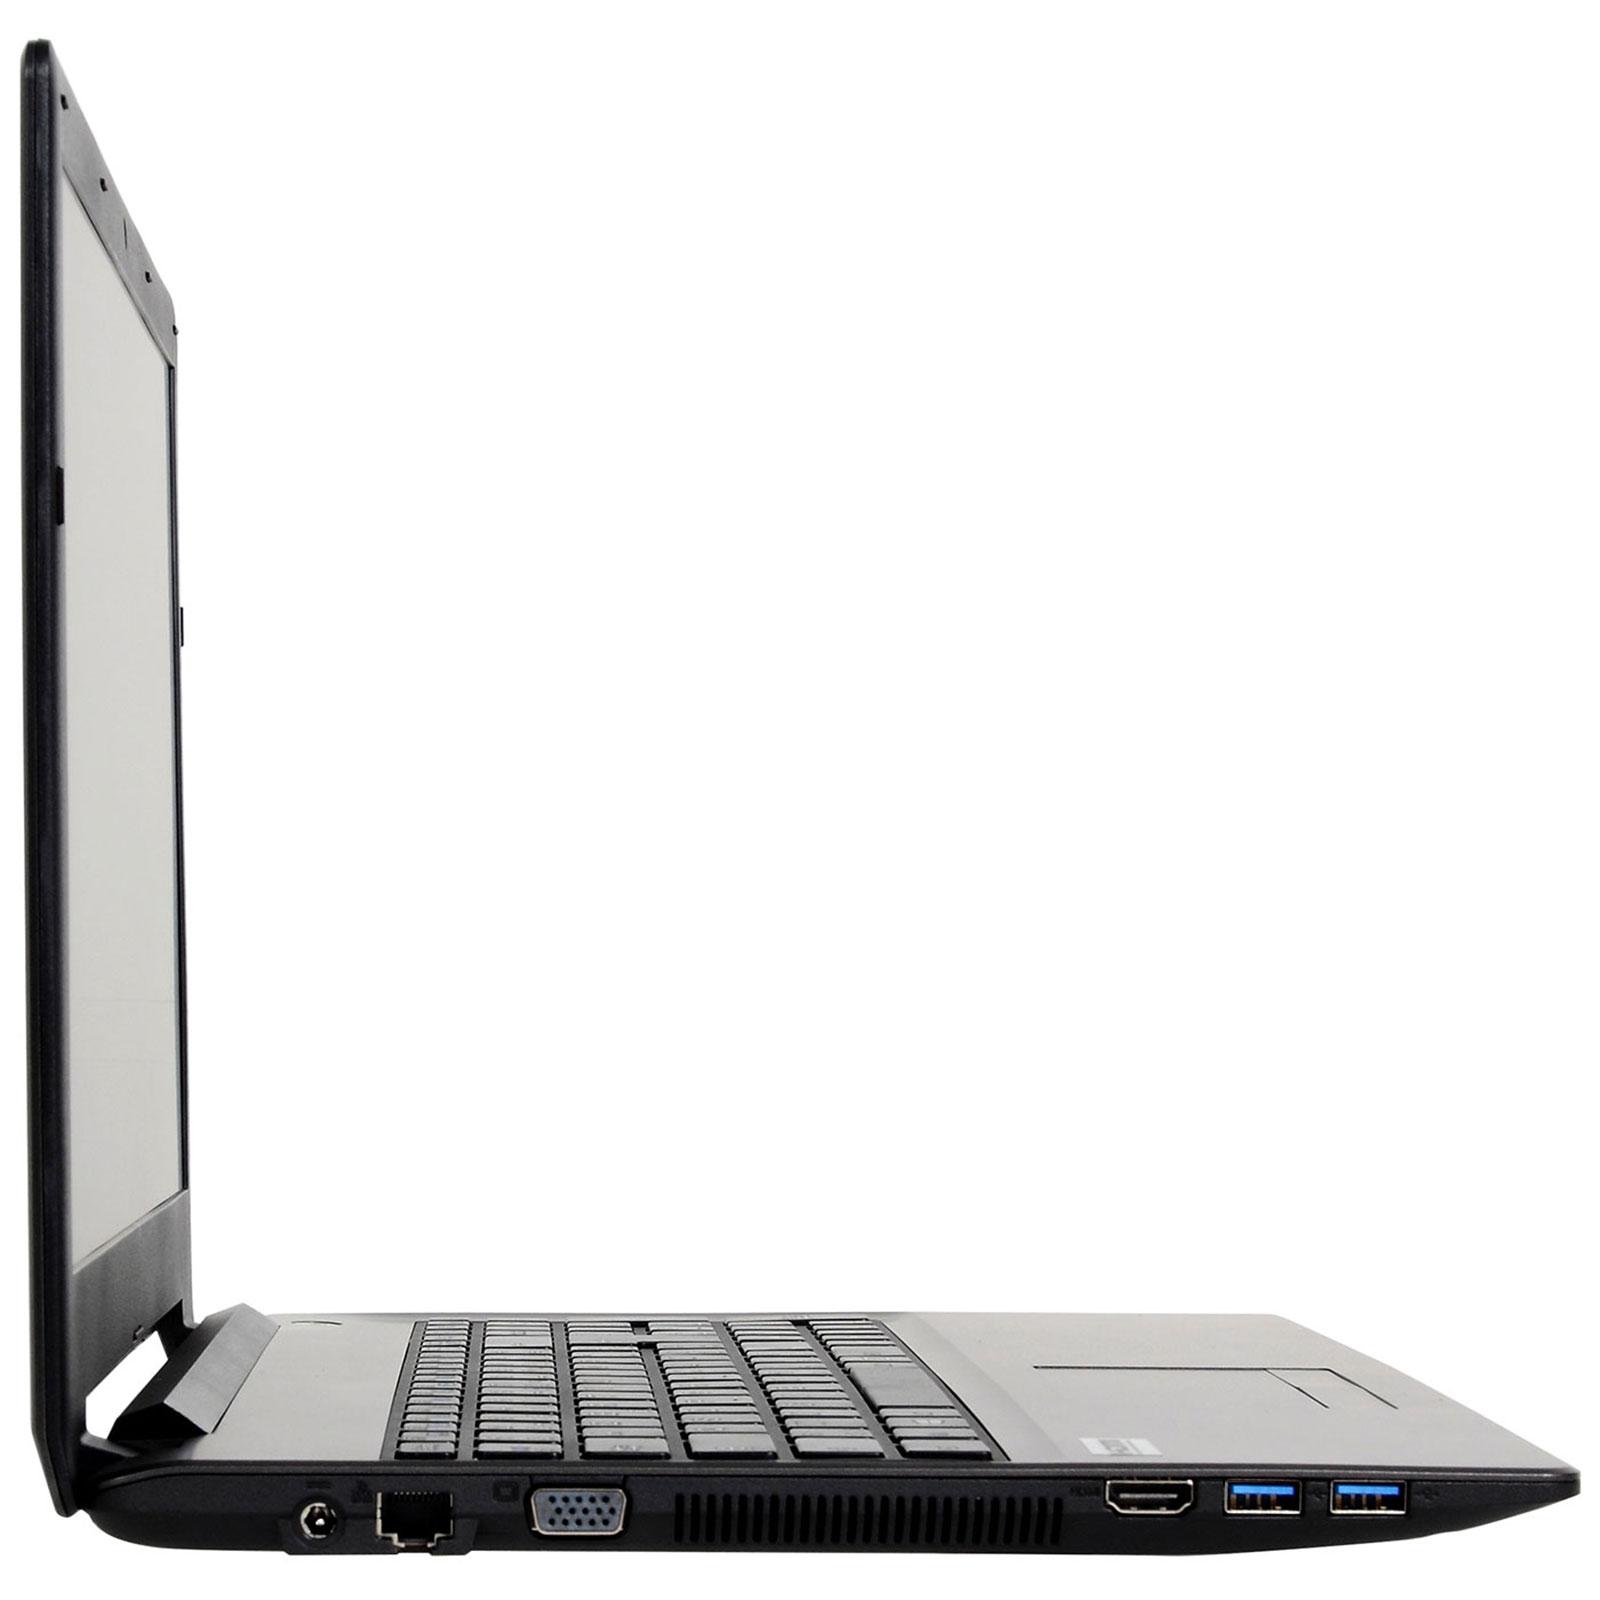 "PC portable LDLC Aurore FP2-4-S1 Intel Pentium 4405U 4 Go SSD 120 Go 15.6"" LED HD Graveur DVD Wi-Fi N/Bluetooth Webcam (sans OS)"